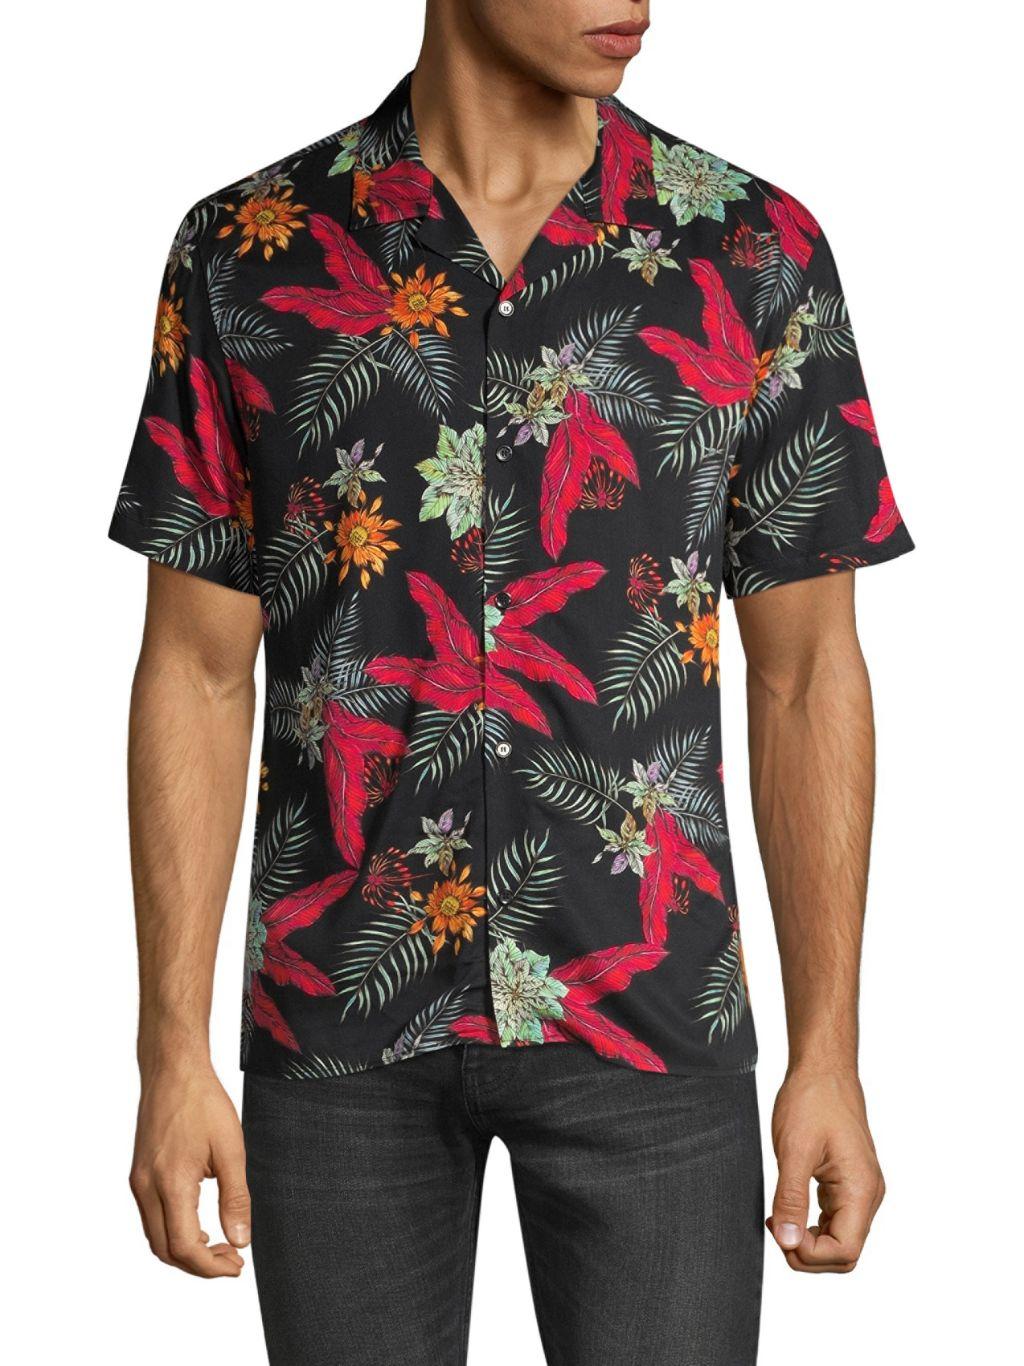 The Kooples Tropical-Print Shirt